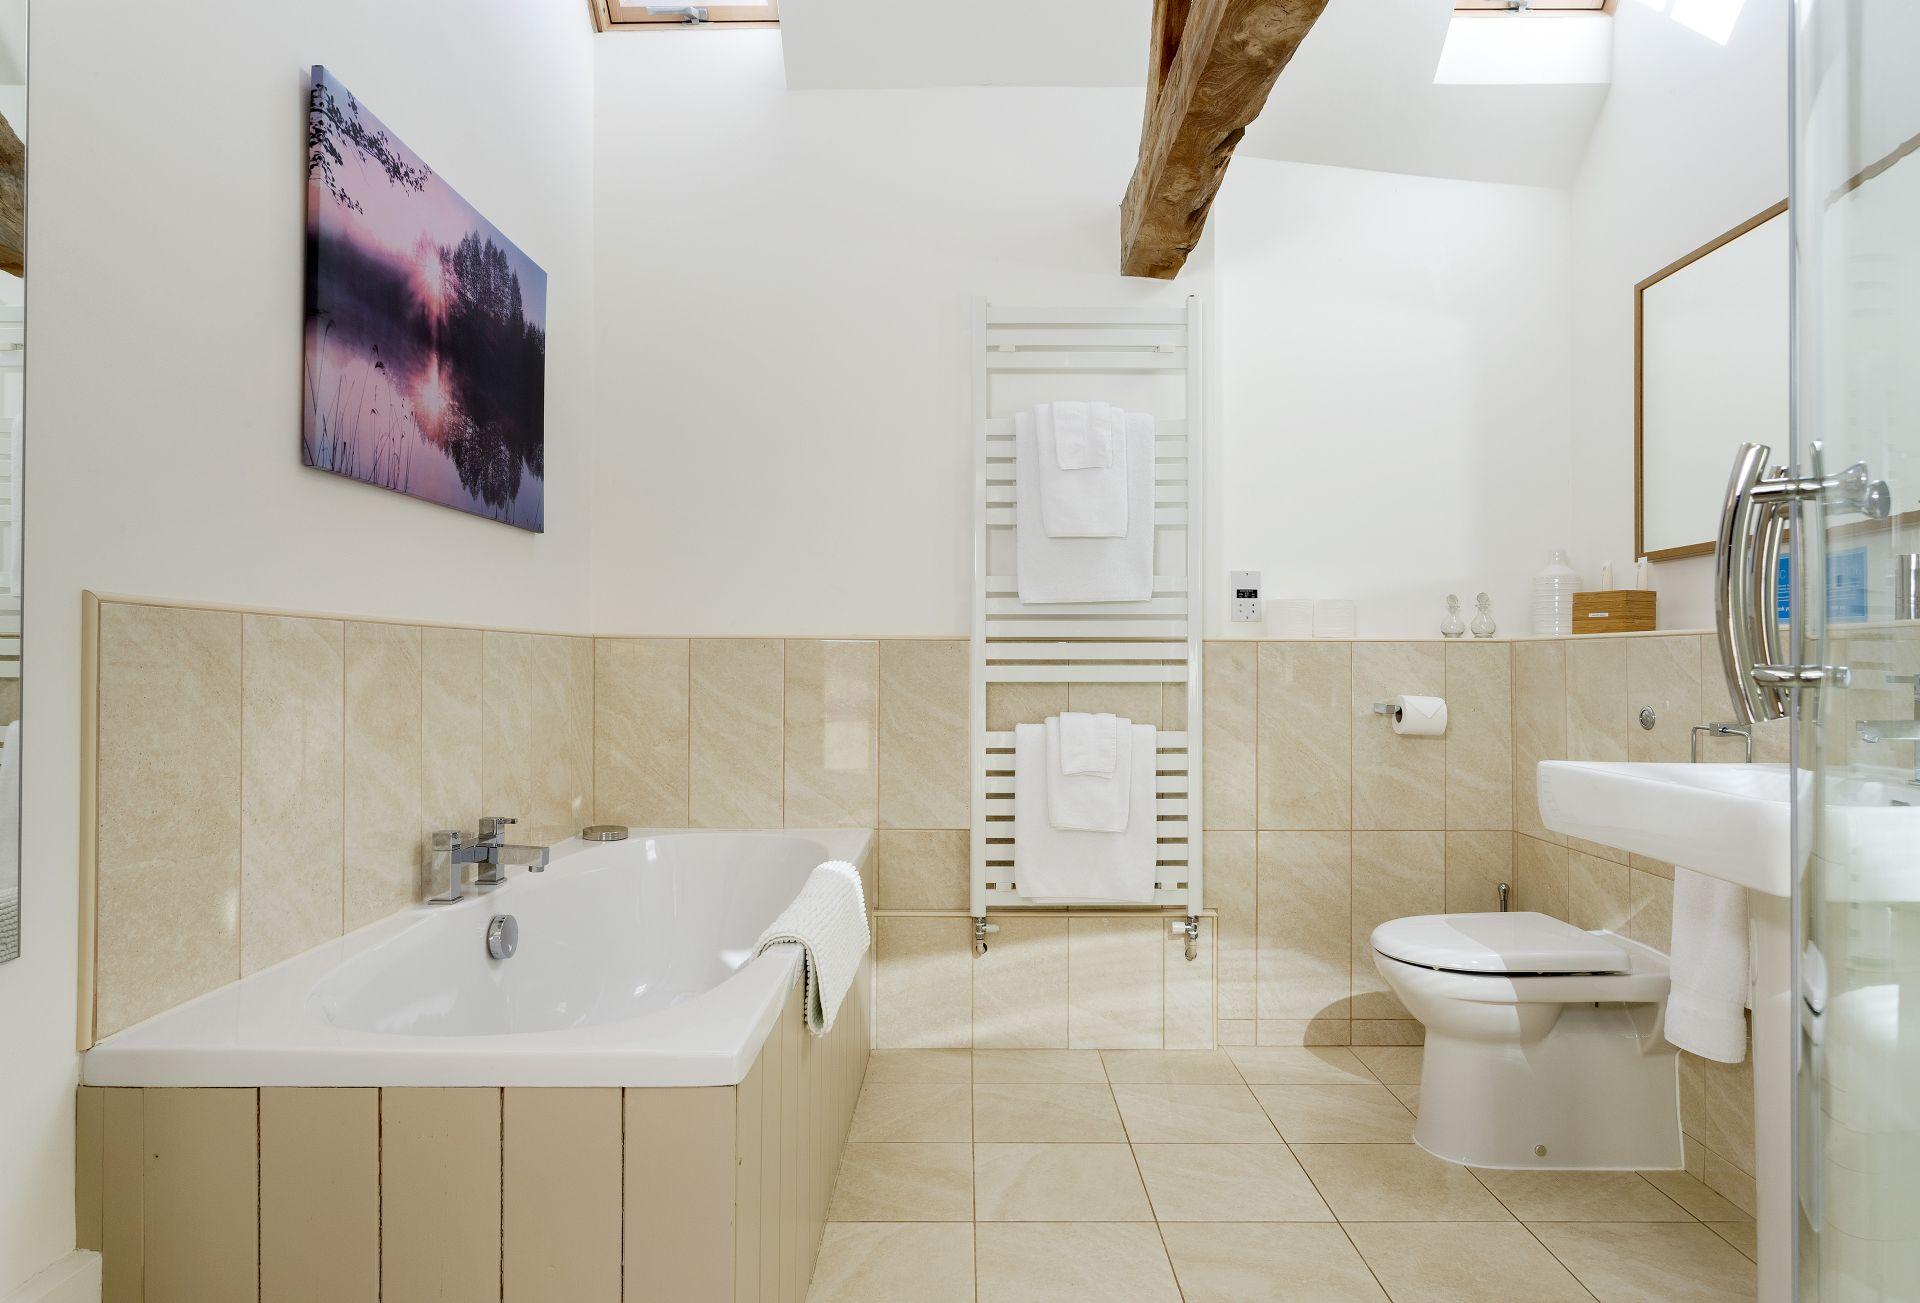 Ground floor: Bathroom